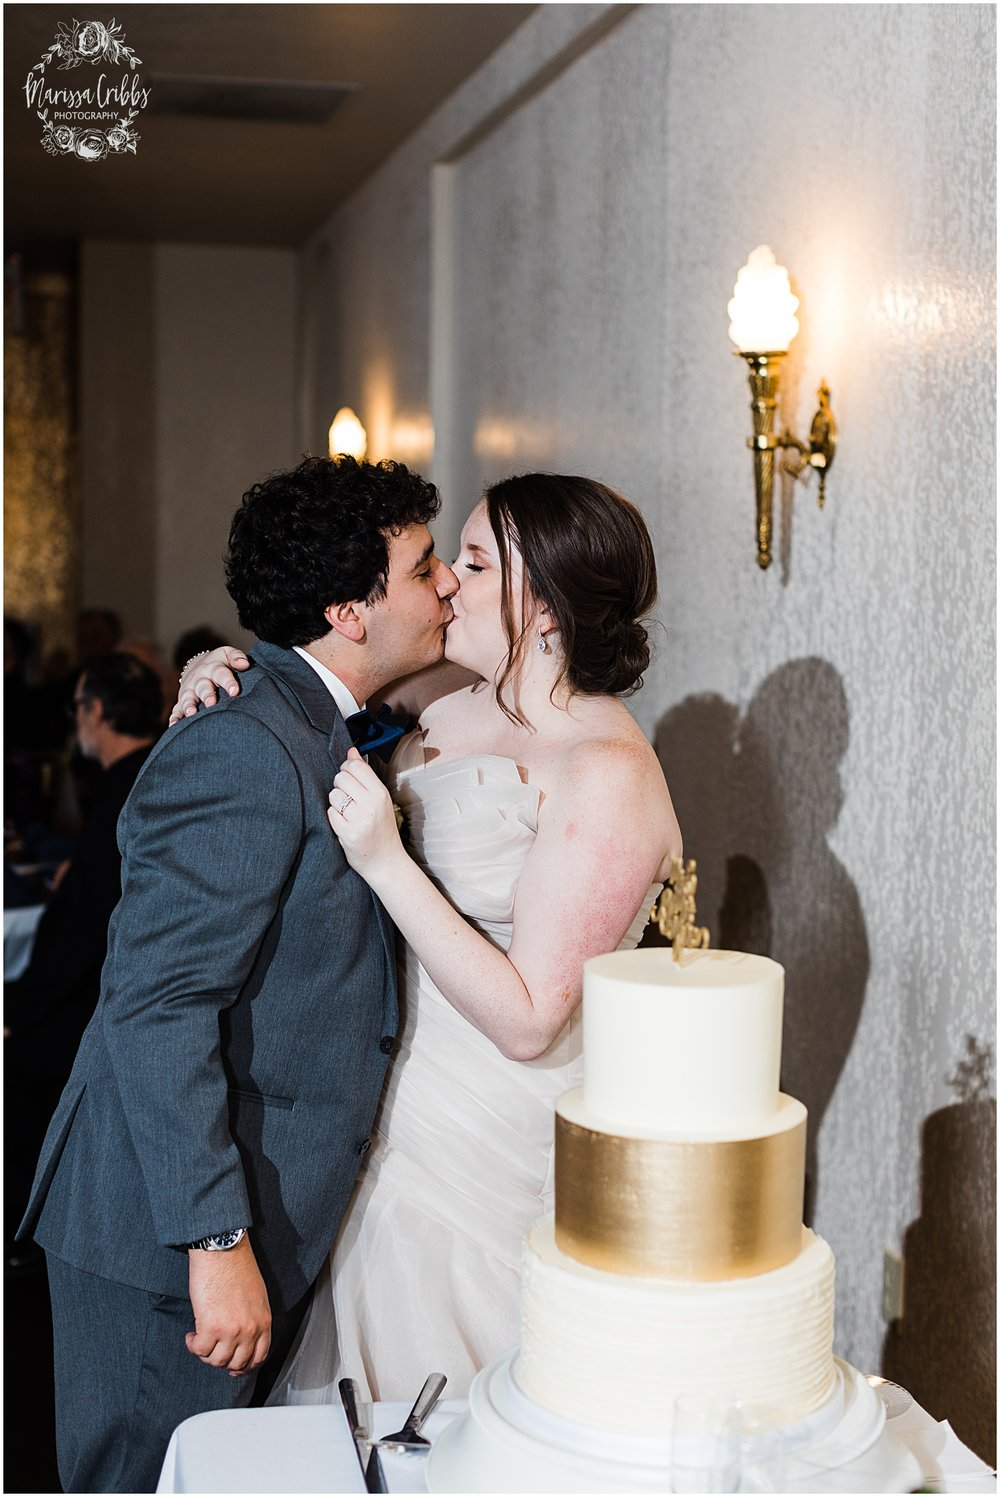 JULIA & AUSTIN MADRID THEATRE WEDDING | MARISSA CRIBBS PHOTOGRAPHY_7135.jpg